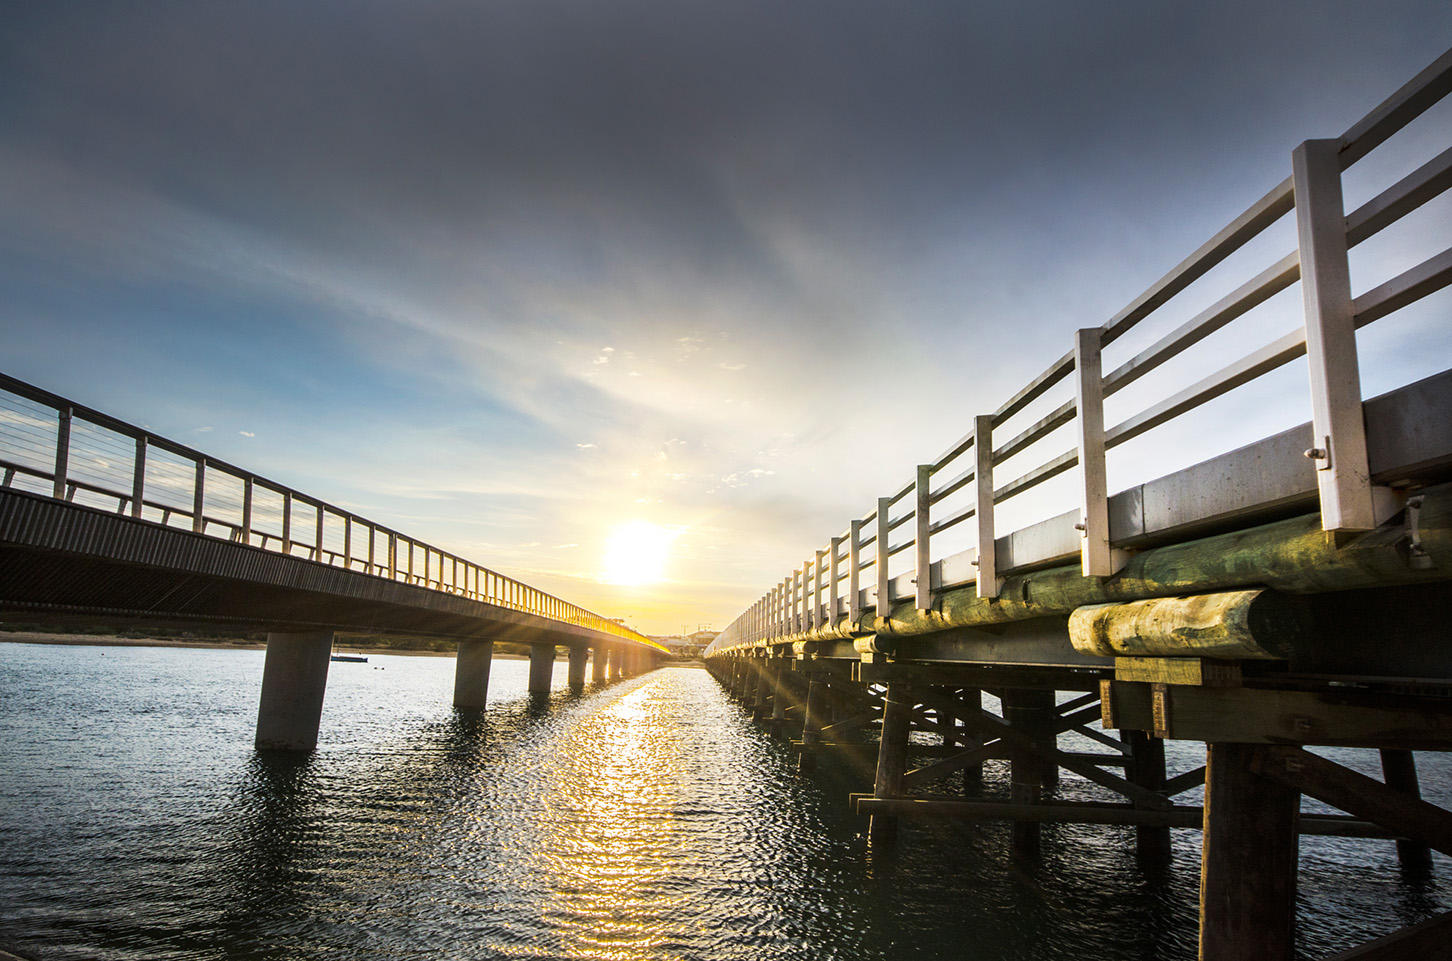 BH Sunset between Bridges